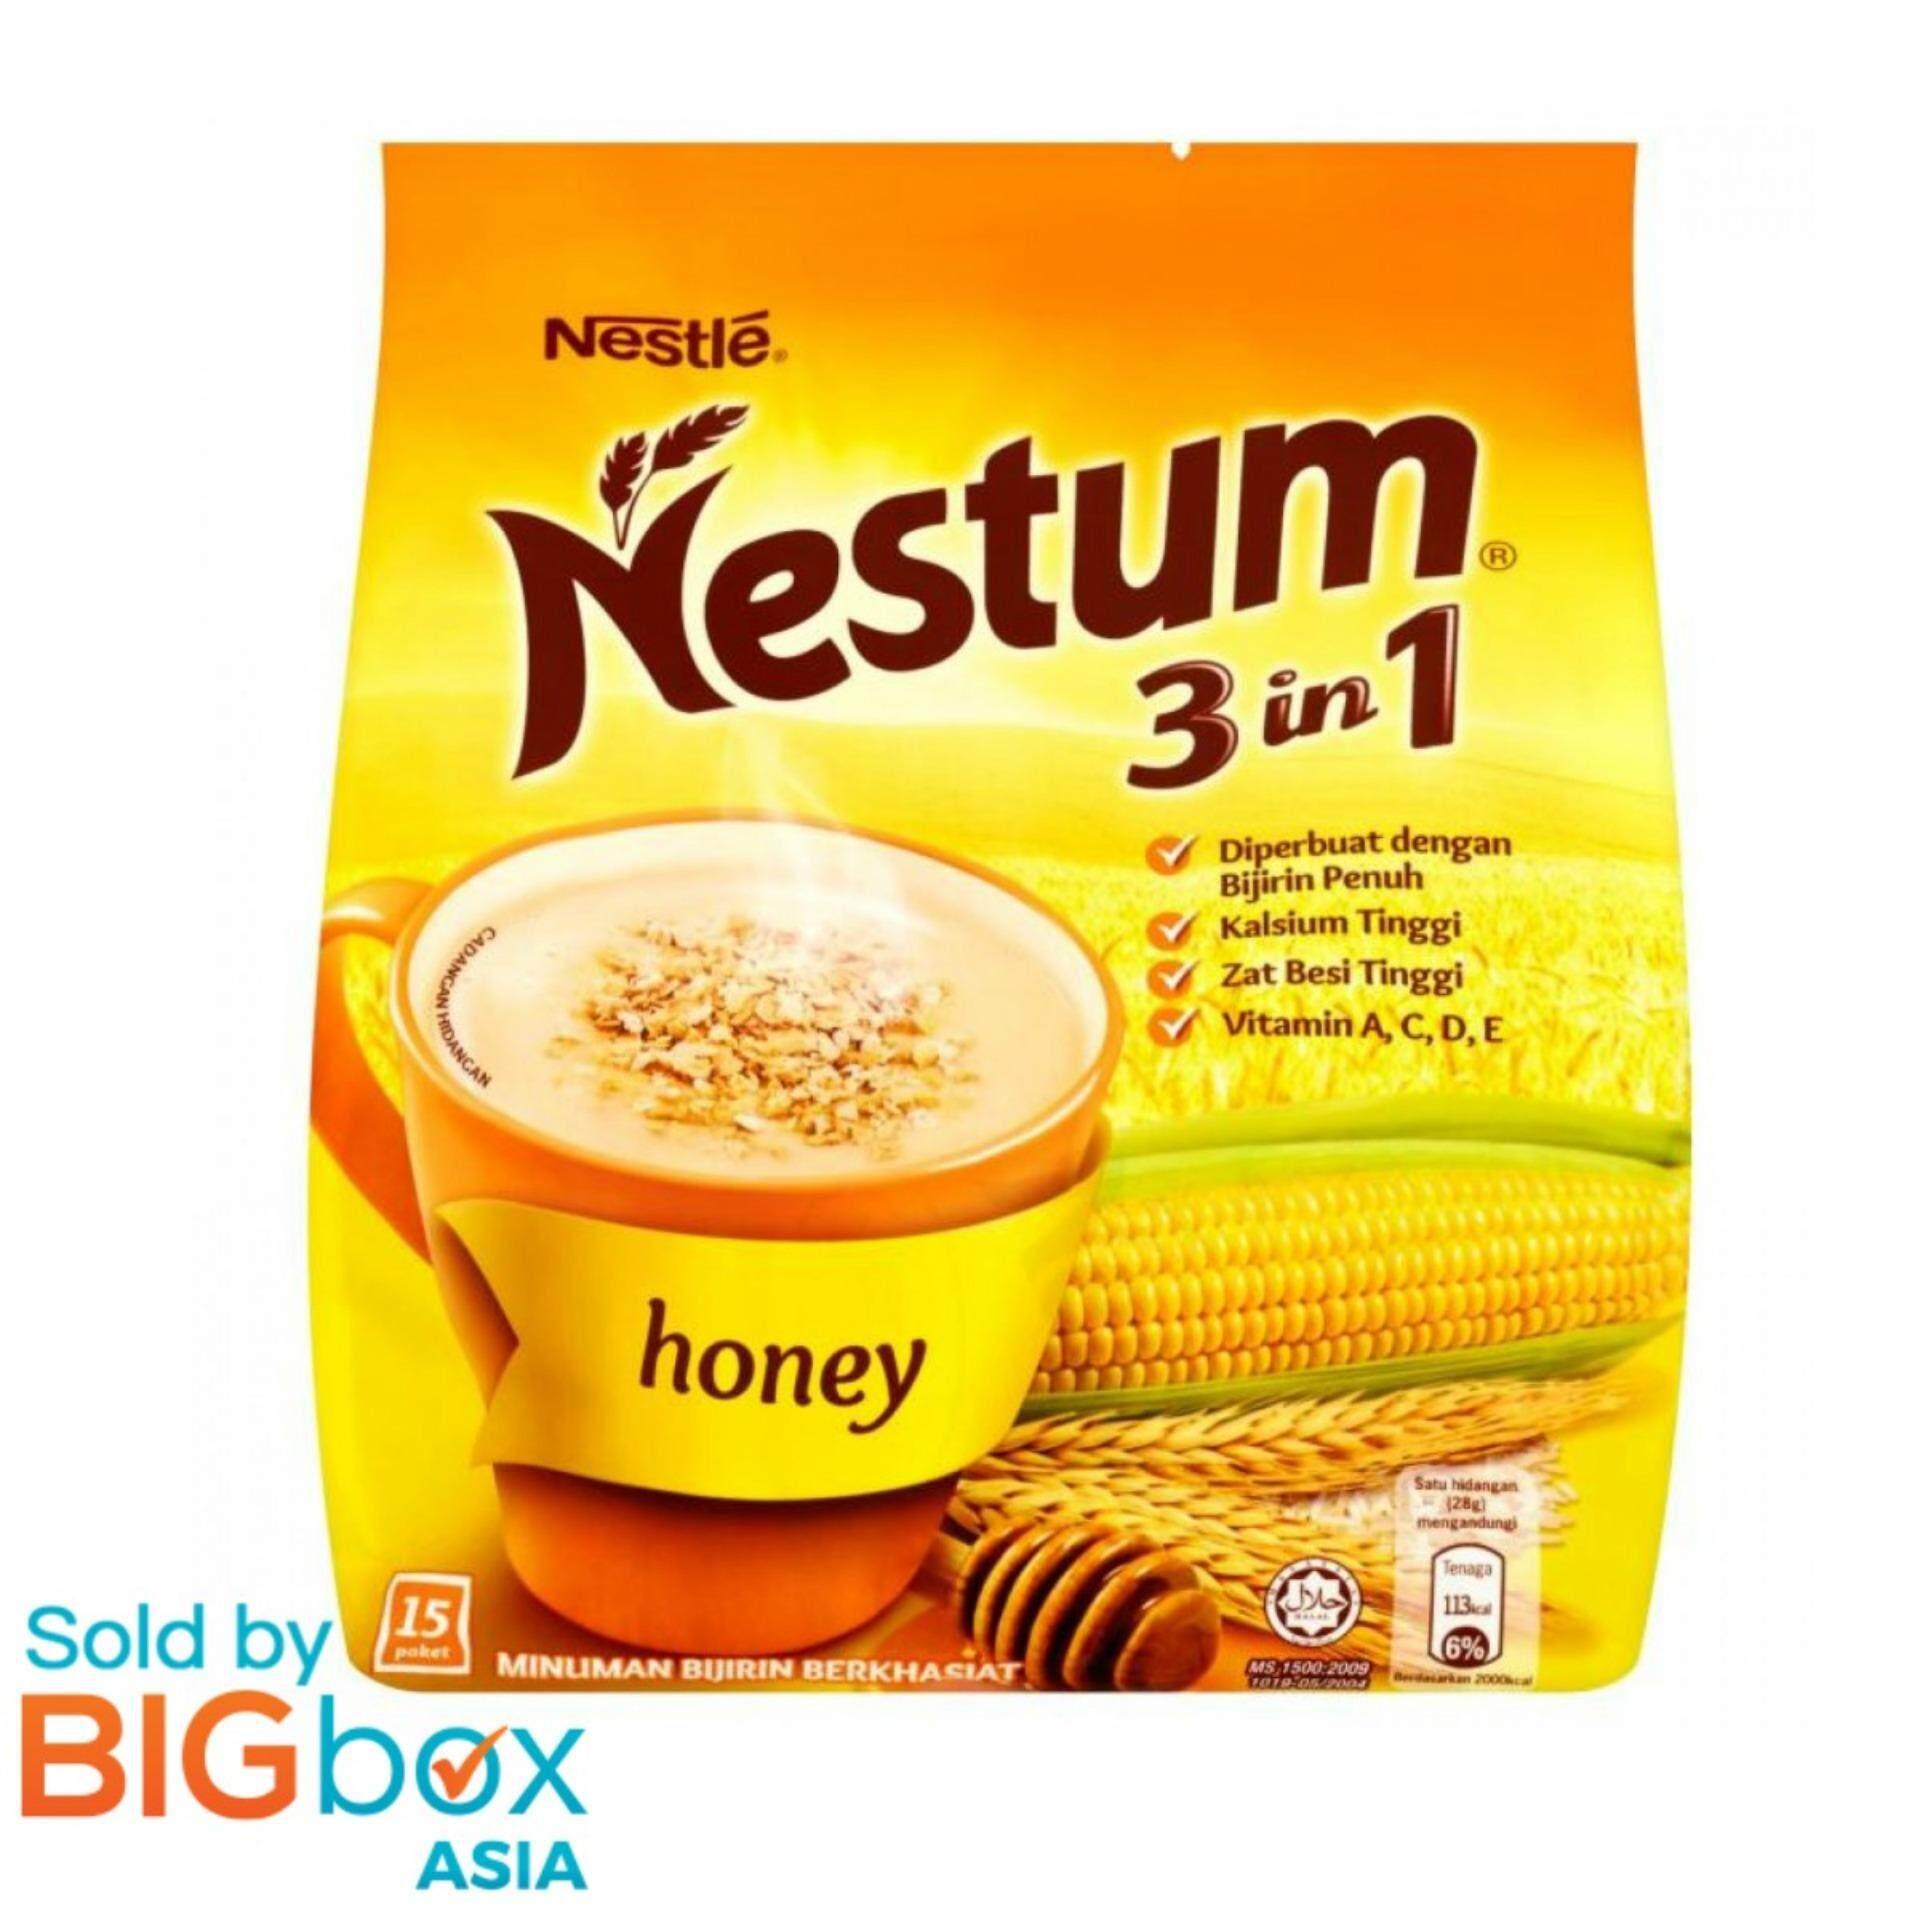 Nestle Nestum 3 In 1 Honey 15 X 28g - Malaysia By Bigbox Asia.